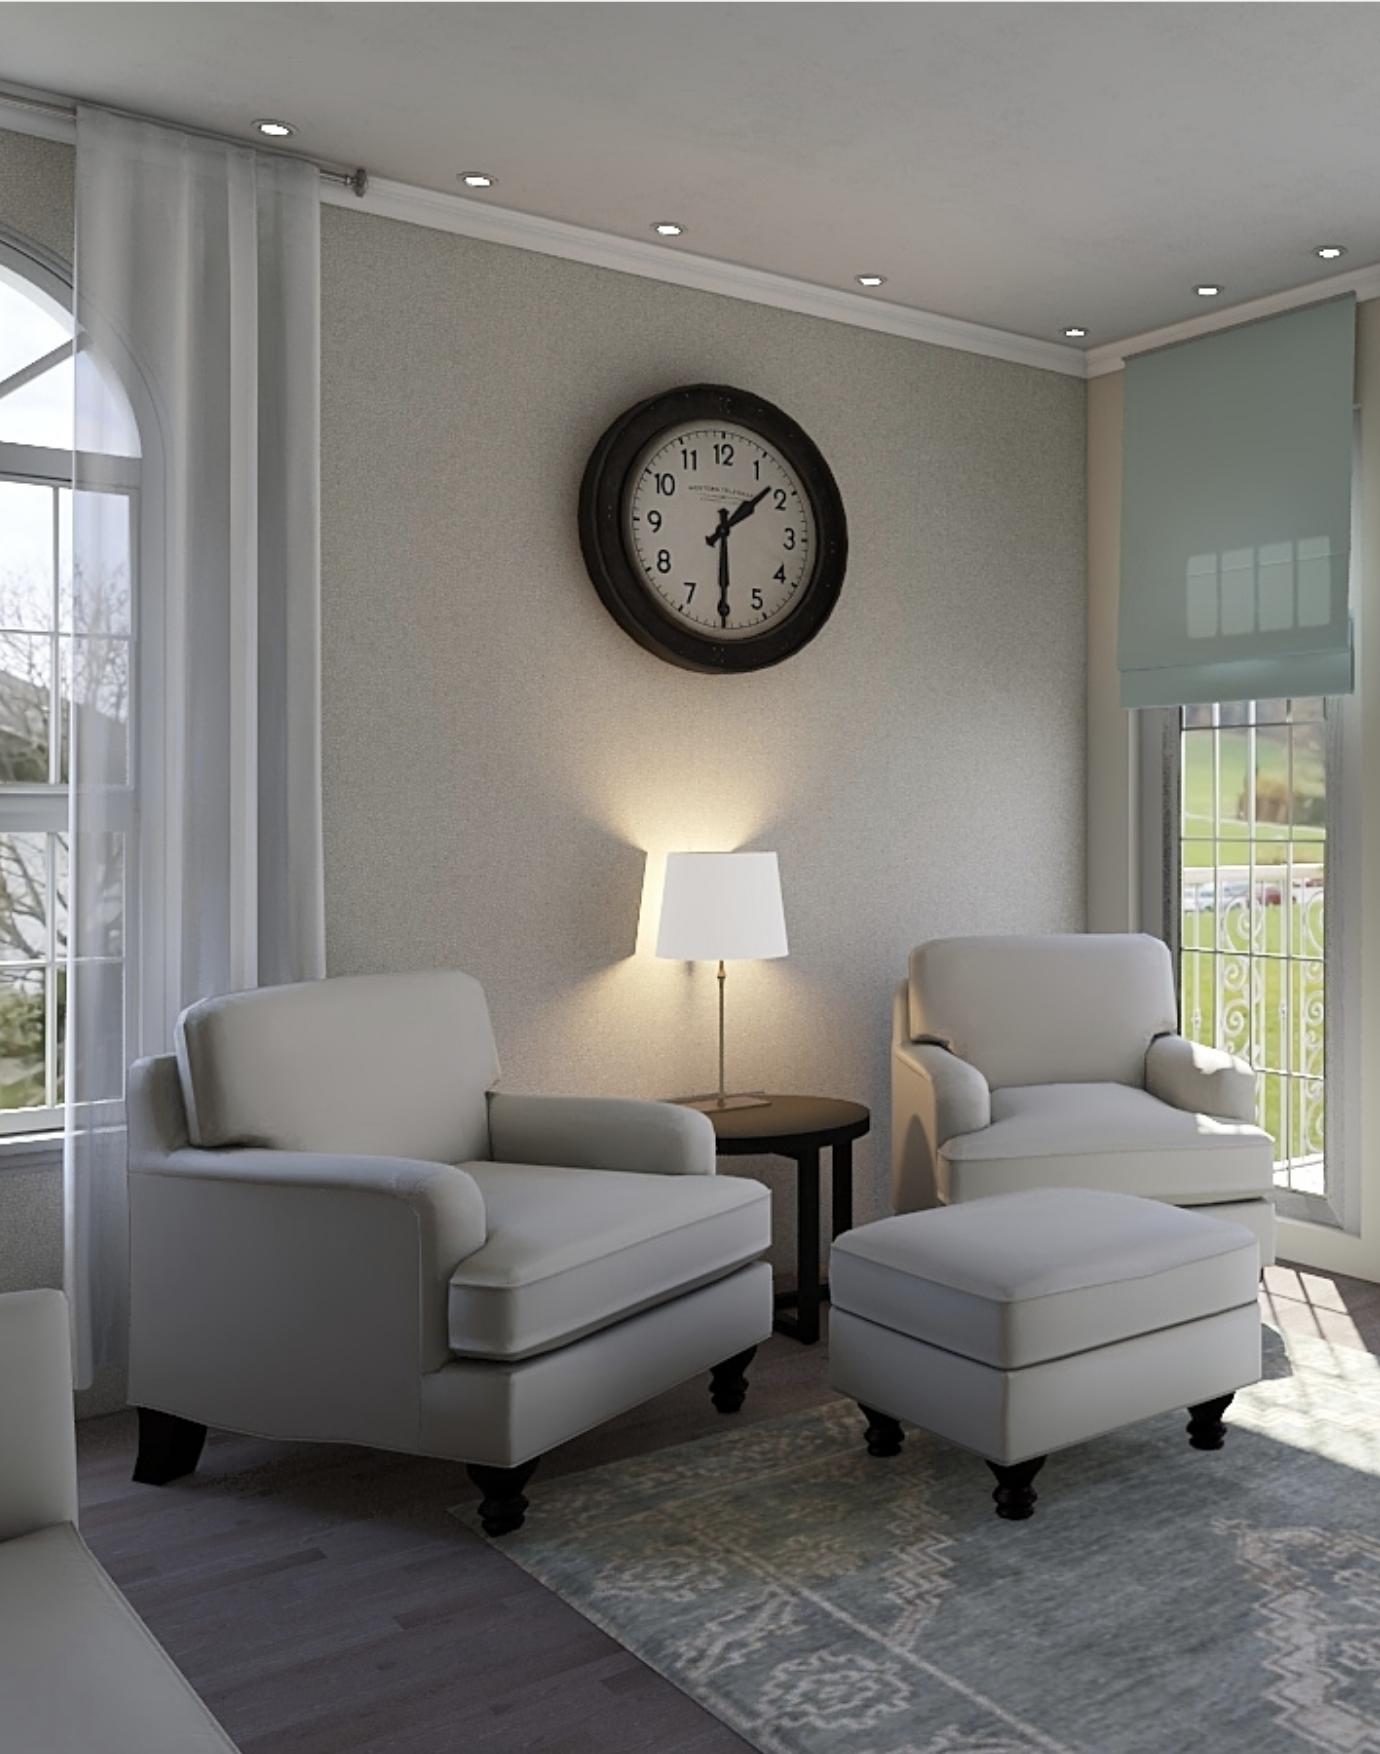 Dream Living Room Designs: Design Your Dream Living Room With Homestyler #livingroom